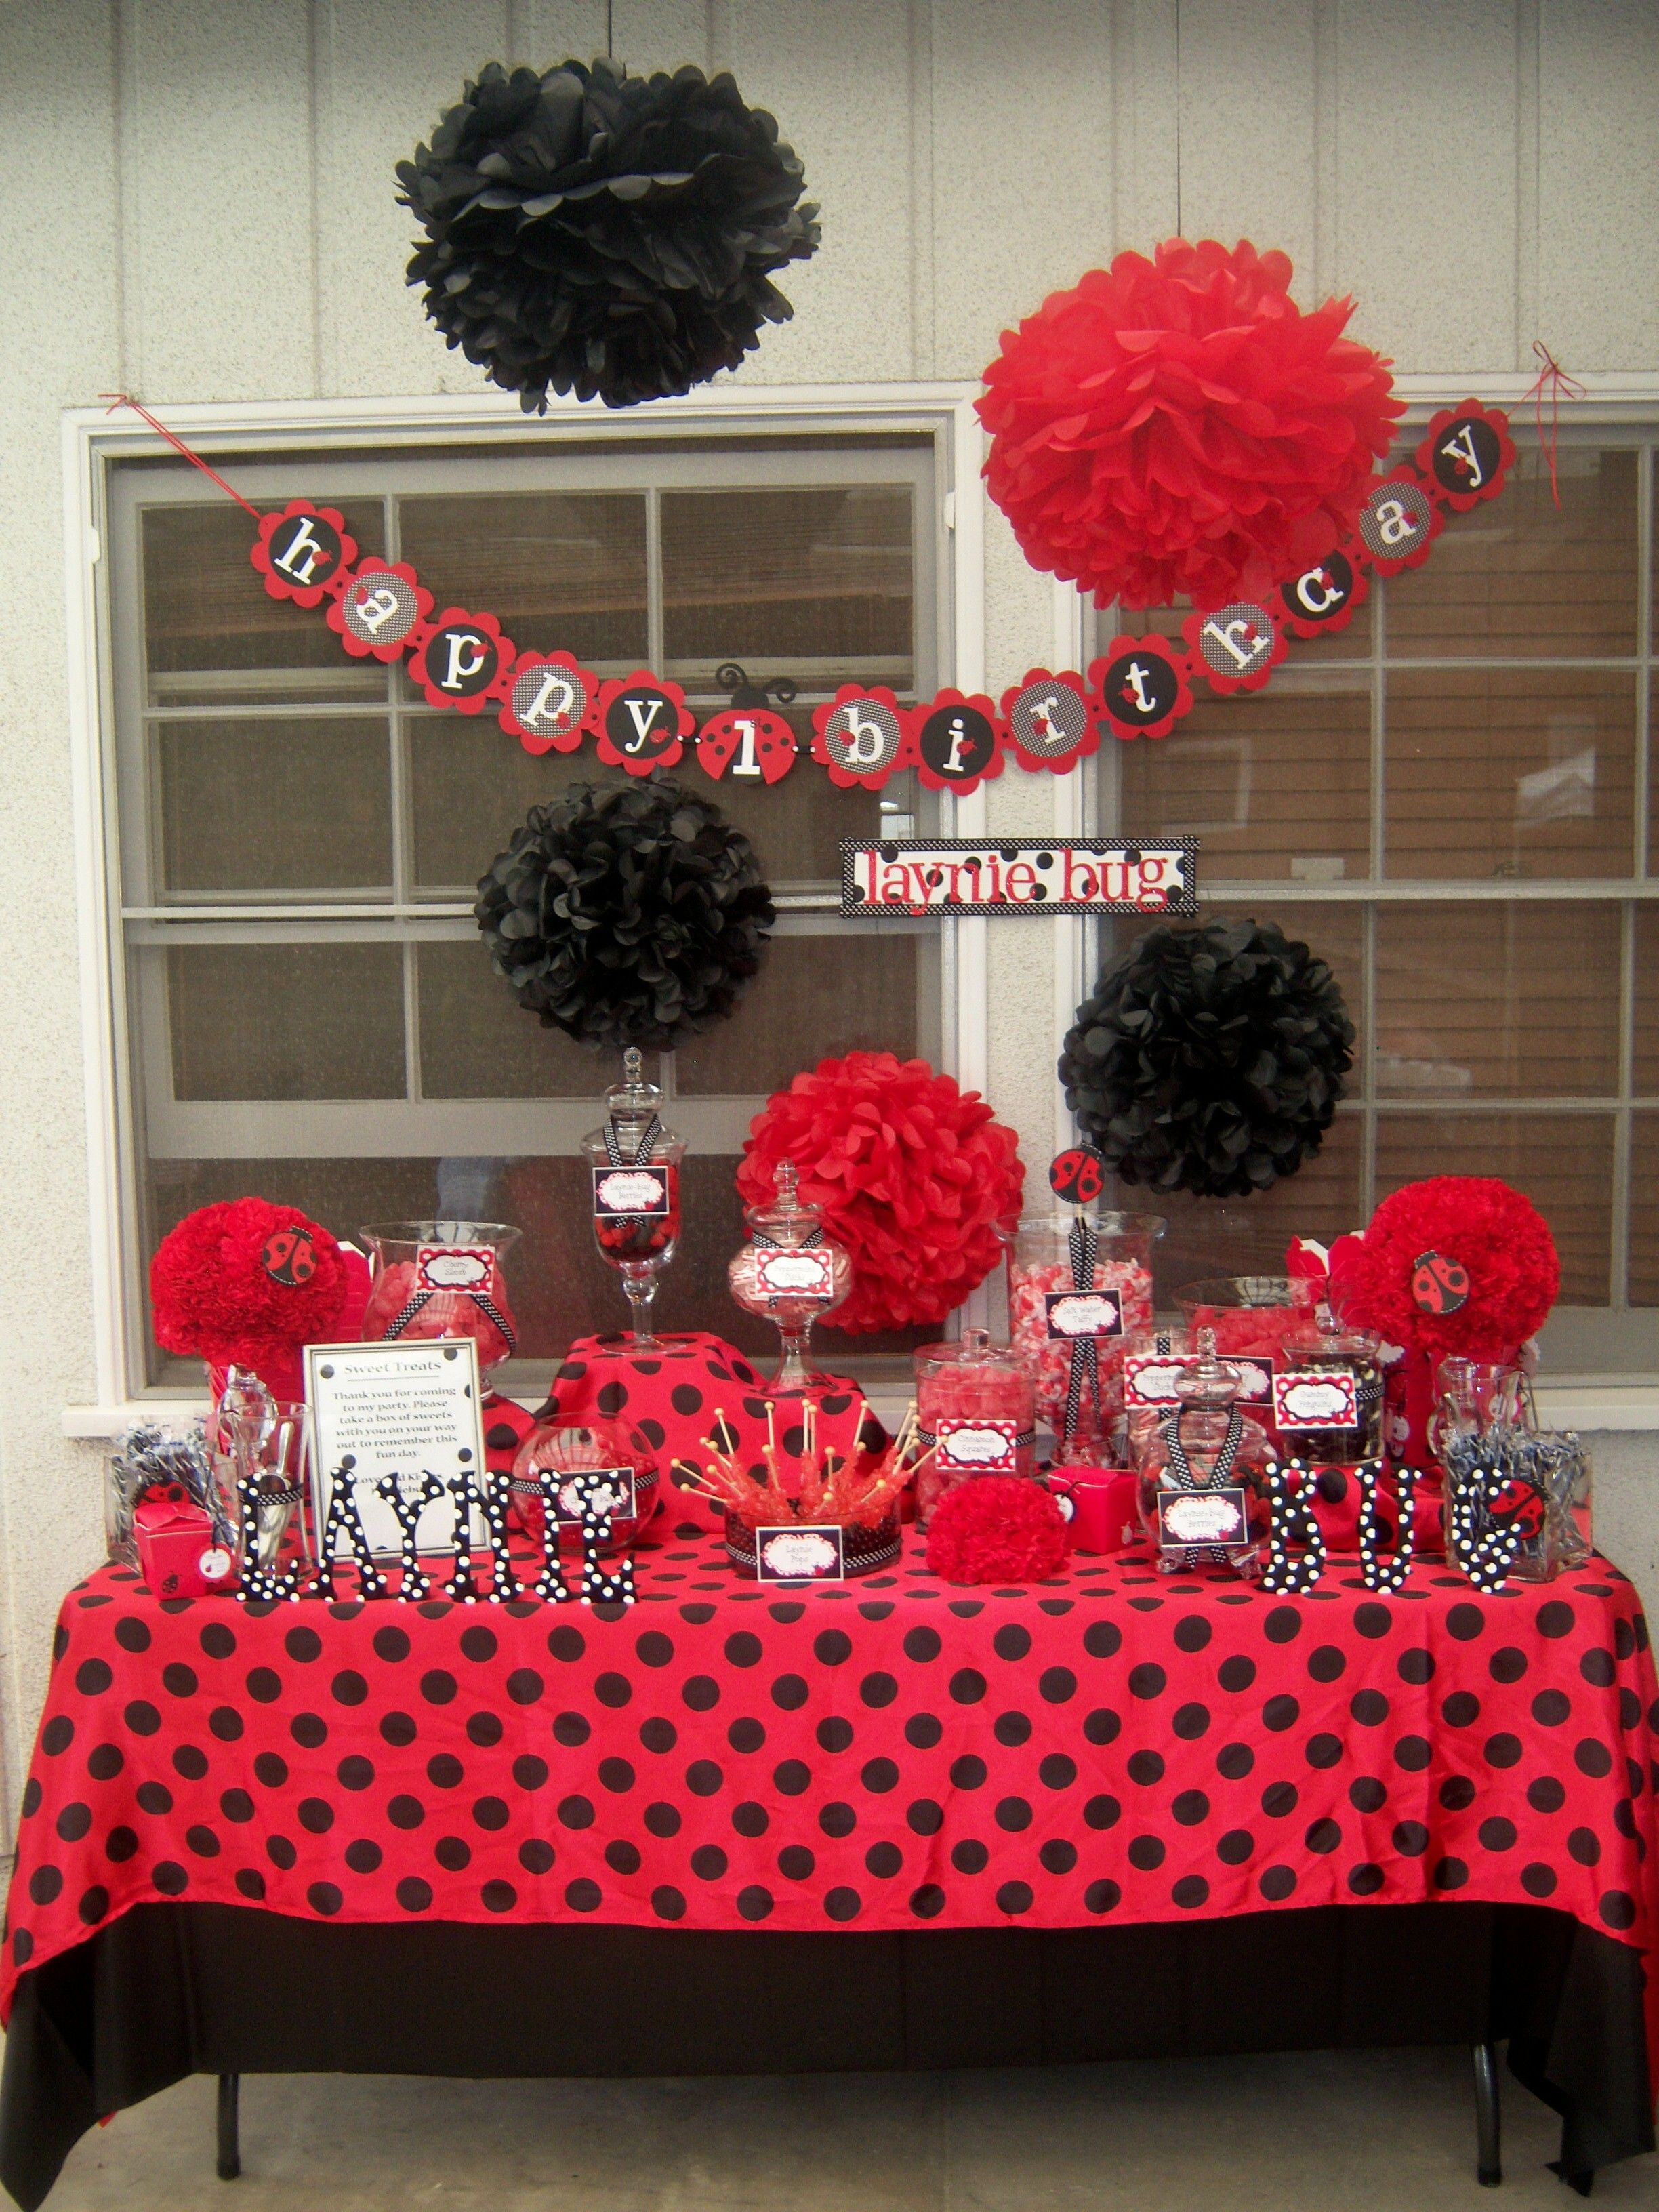 Best ideas about Ladybug Birthday Decorations . Save or Pin Ladybug Birthday ladybug birthday Now.